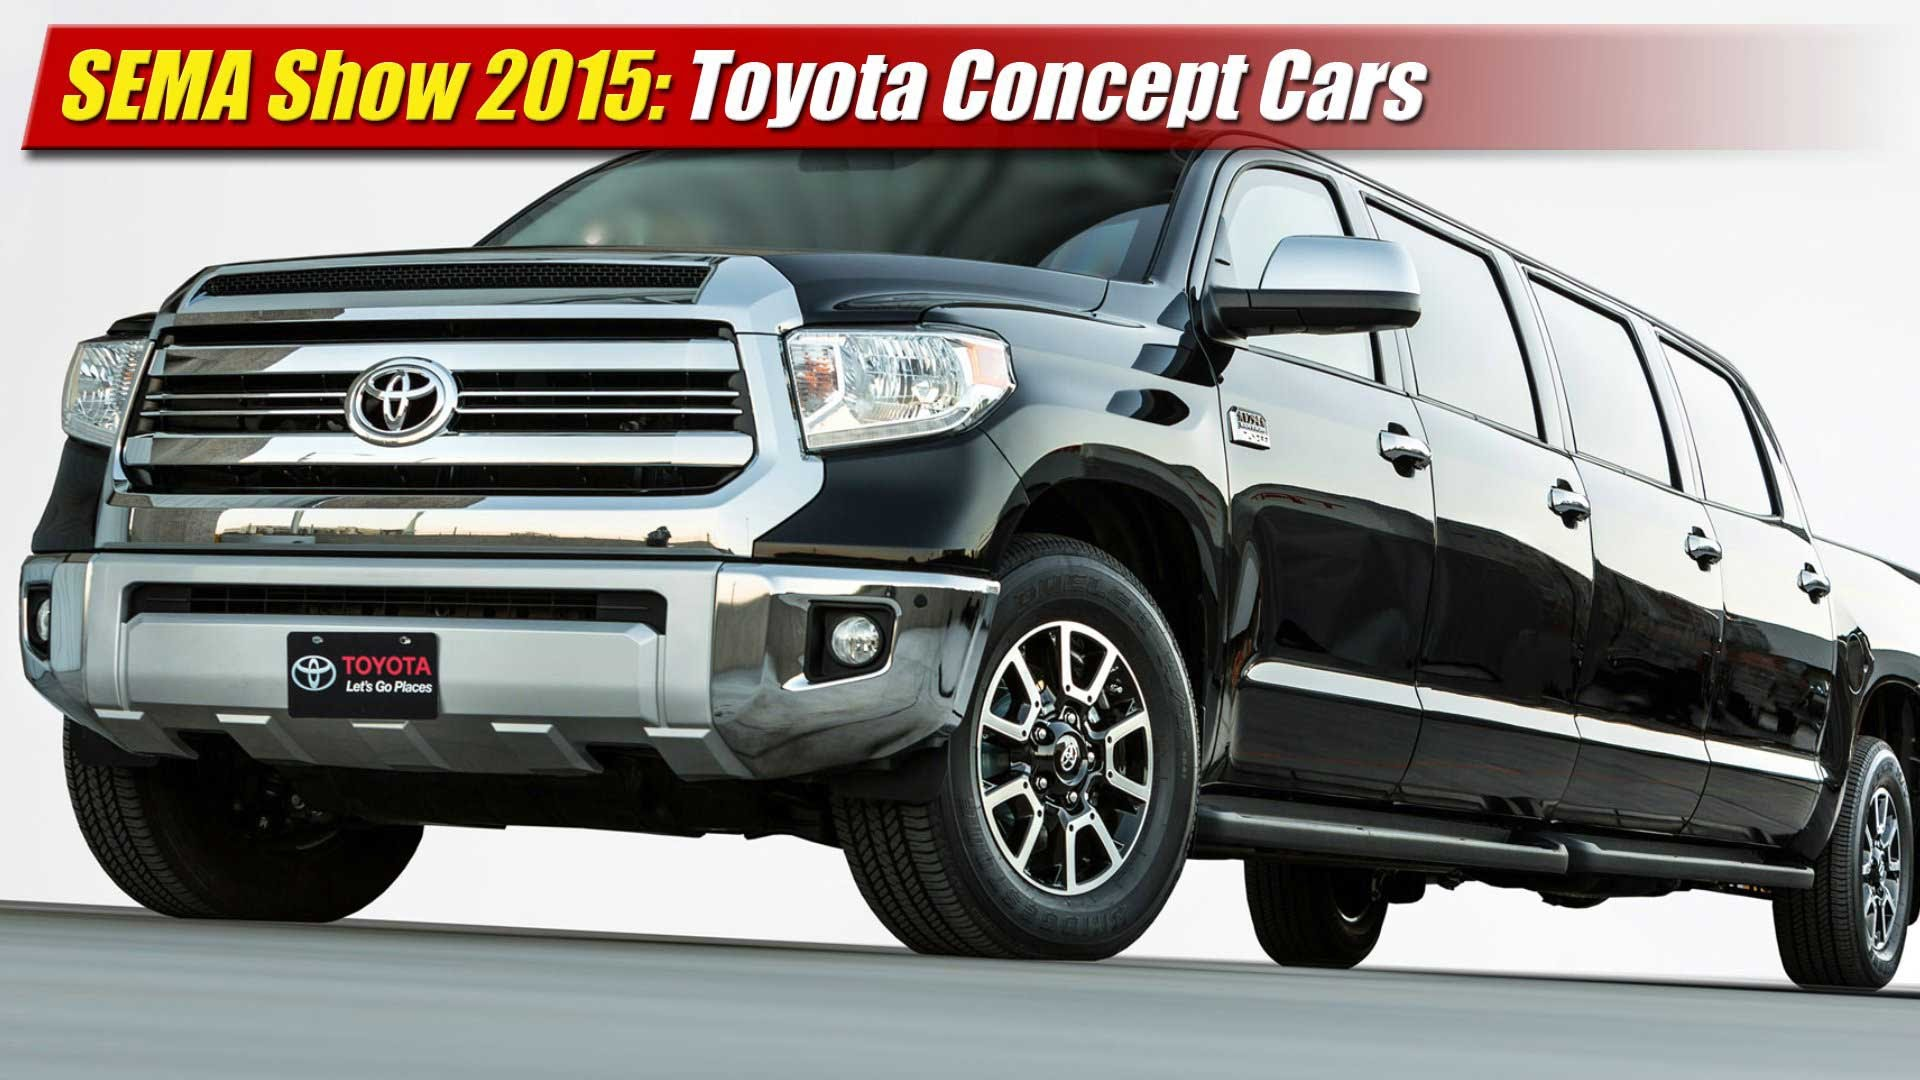 SEMA Show 2015: Toyota Concepts